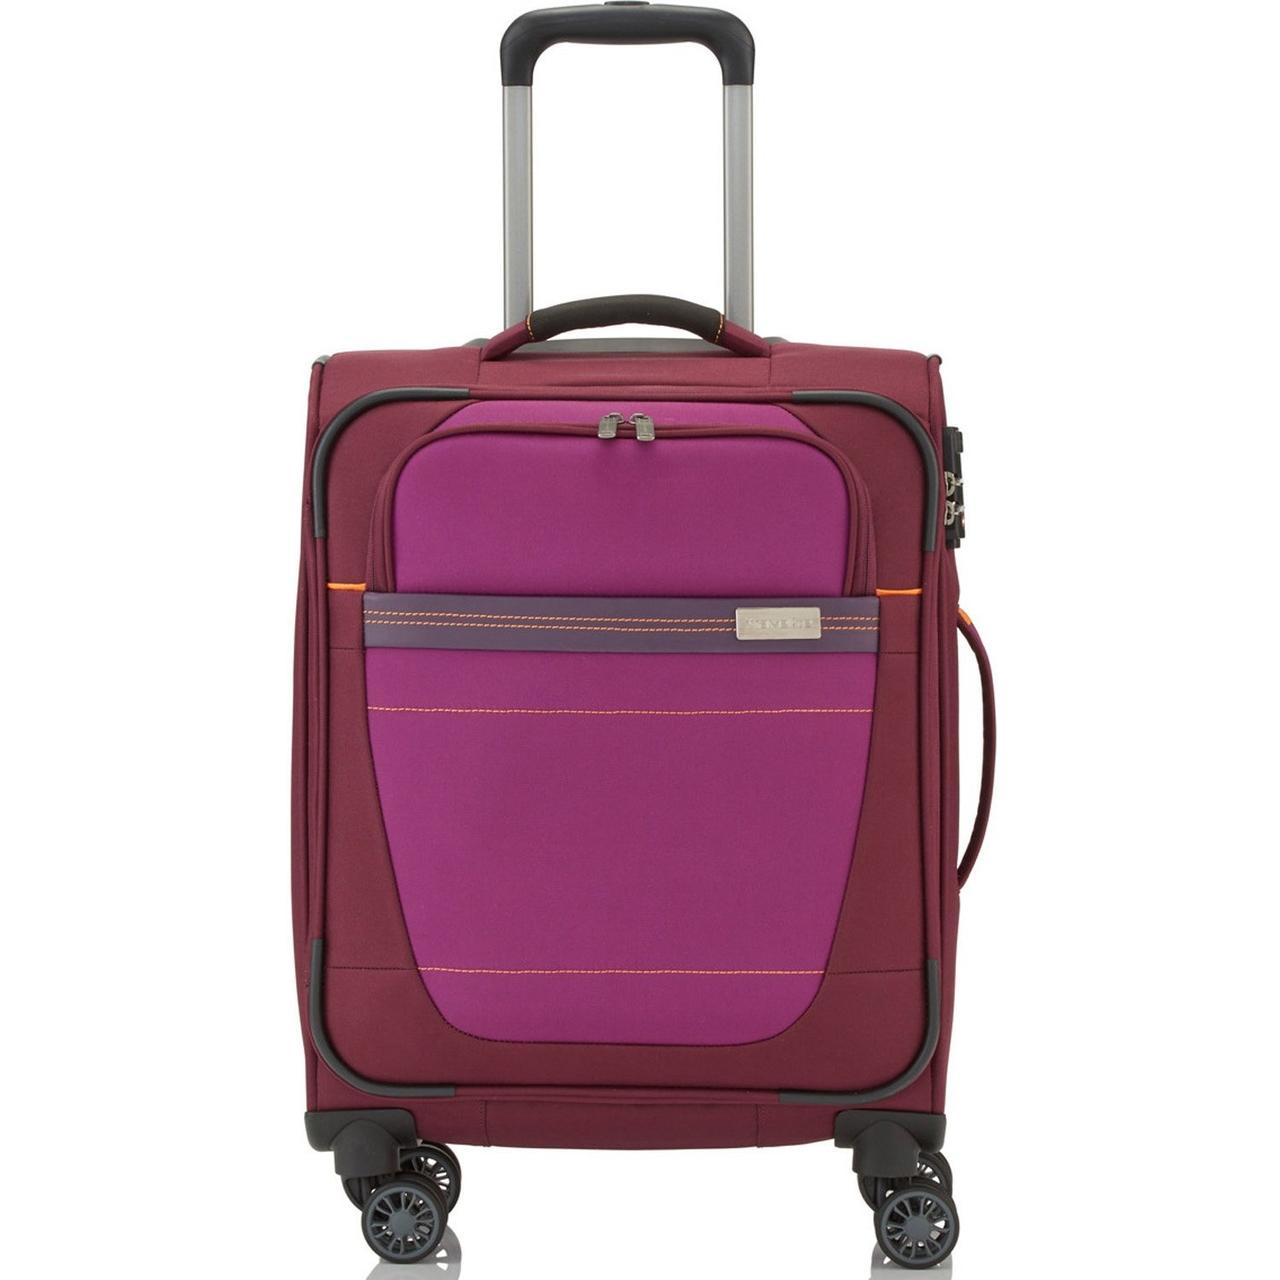 Малый тканевый чемодан Travelite Meteor  S TL089447-17, 38 л